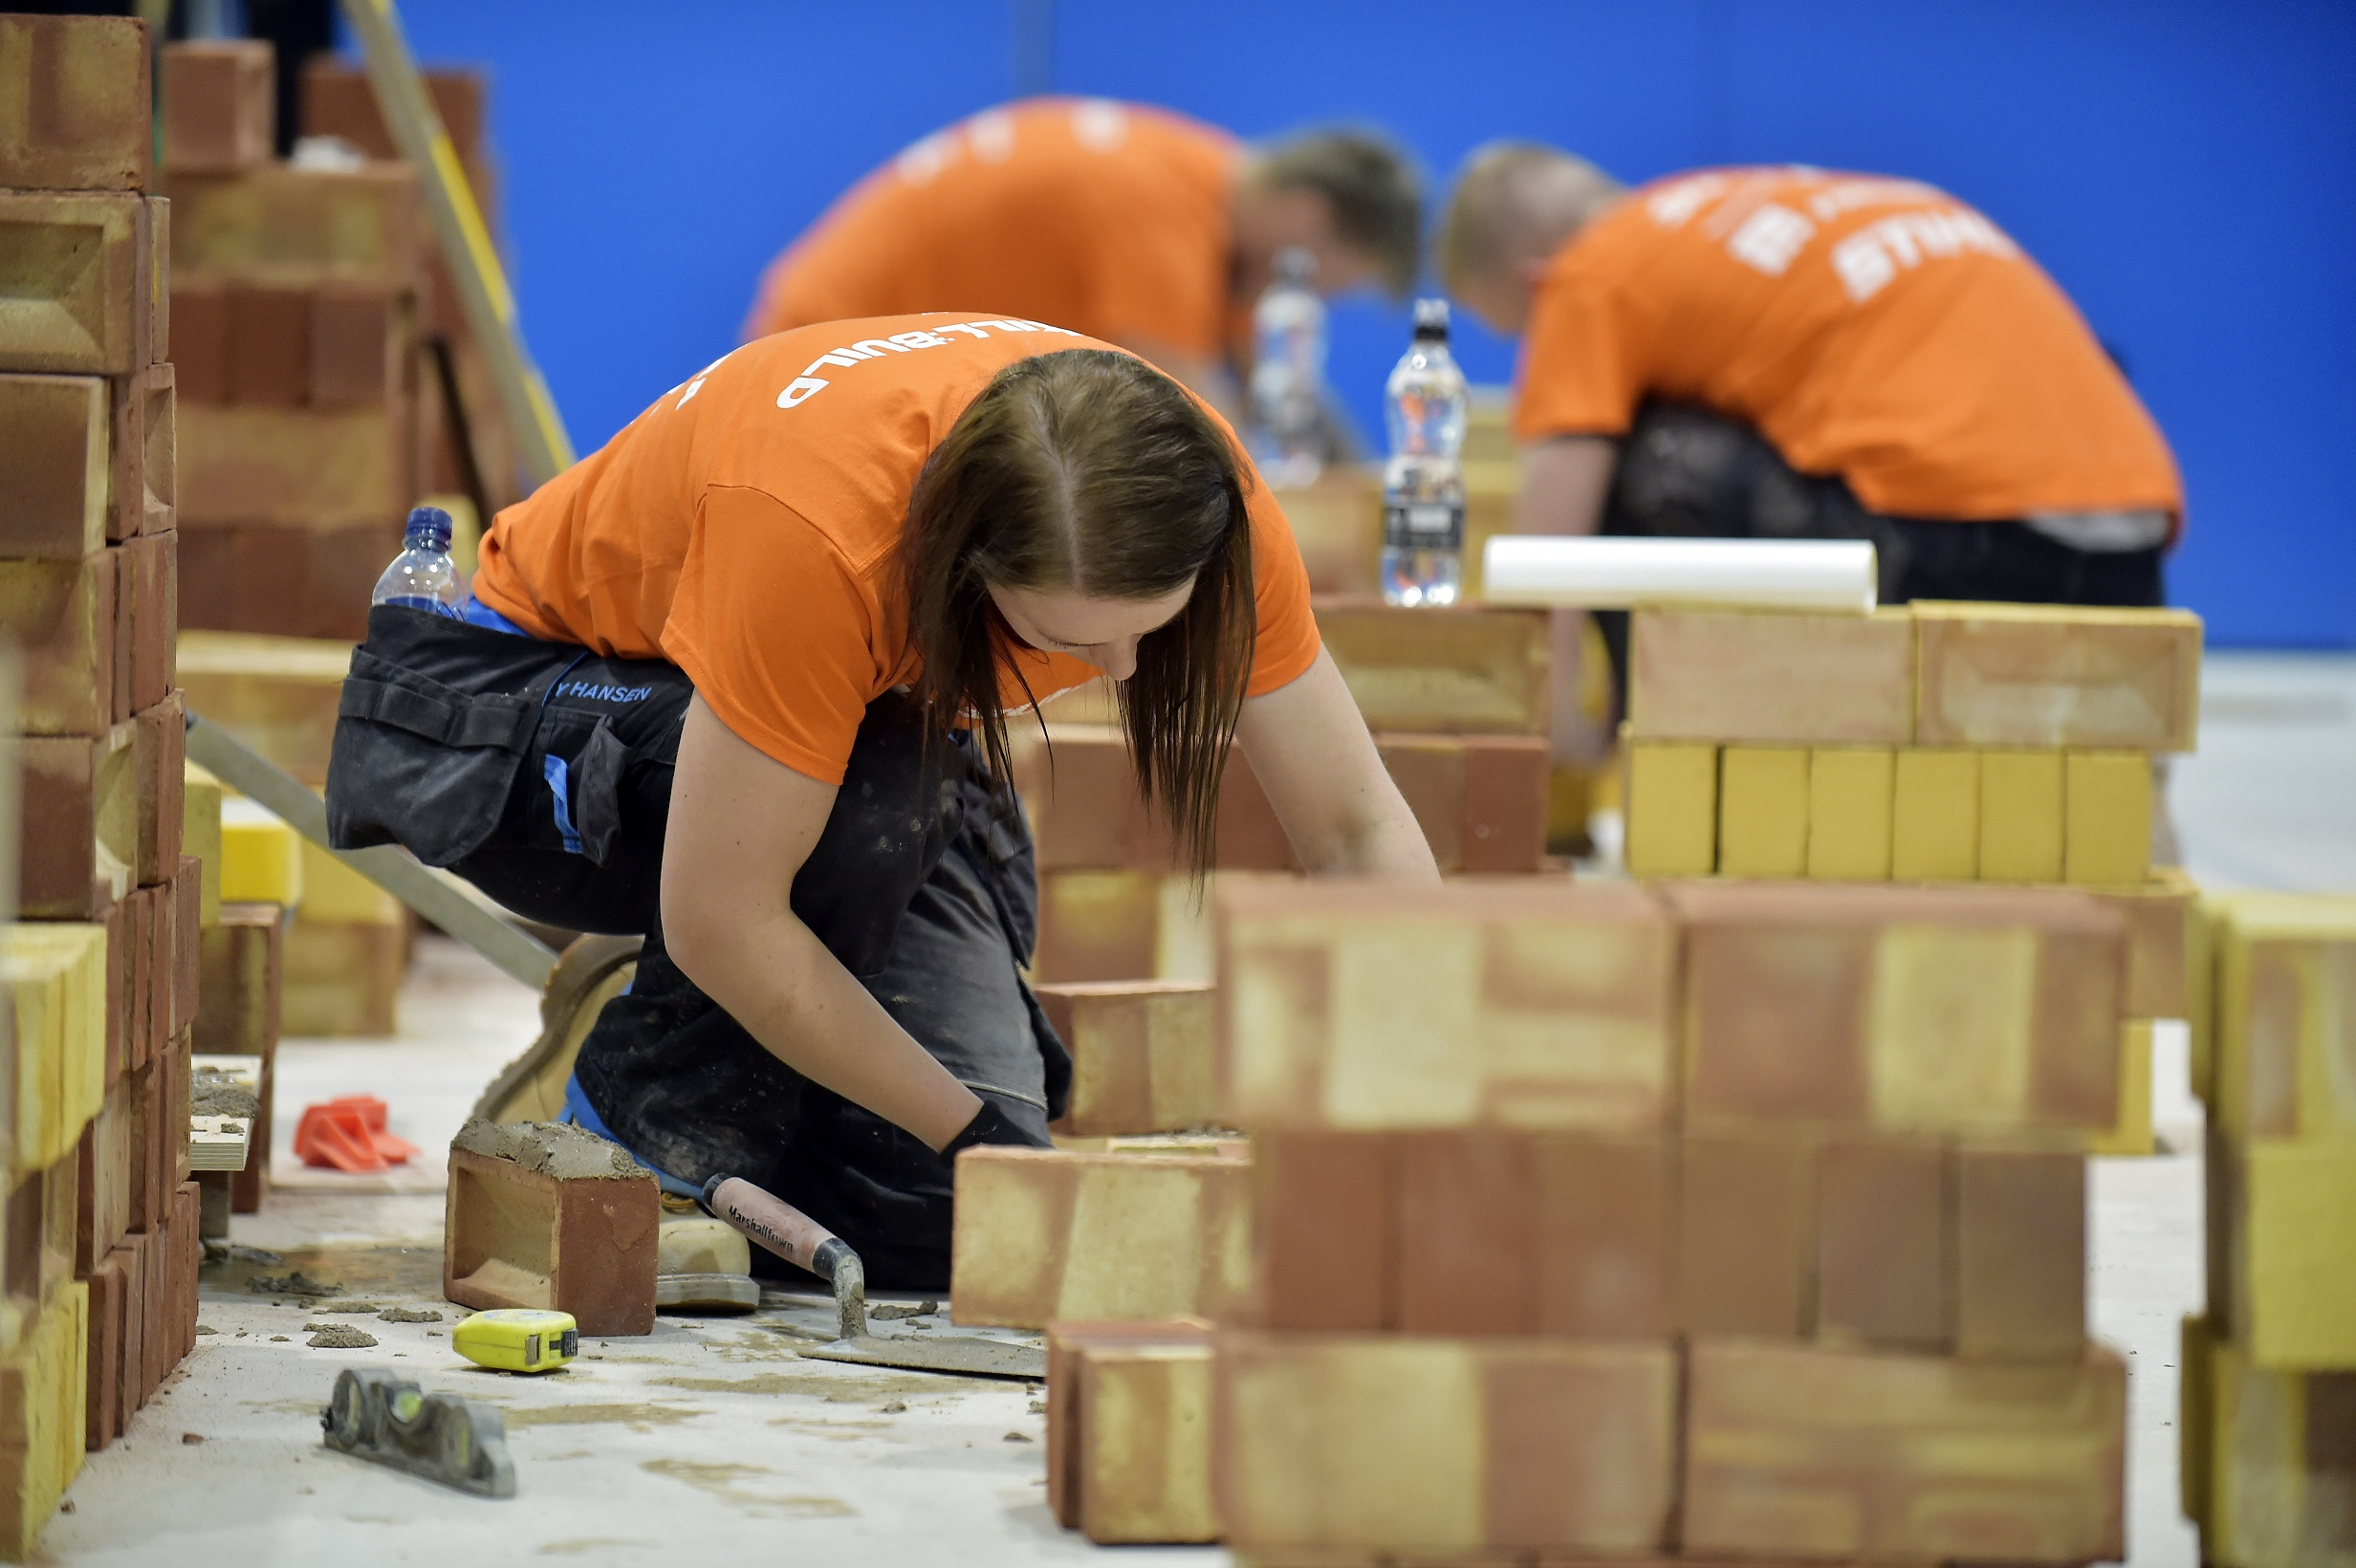 Forterra donates over 40,000 bricks to UK colleges for prestigious SkillBuild competition